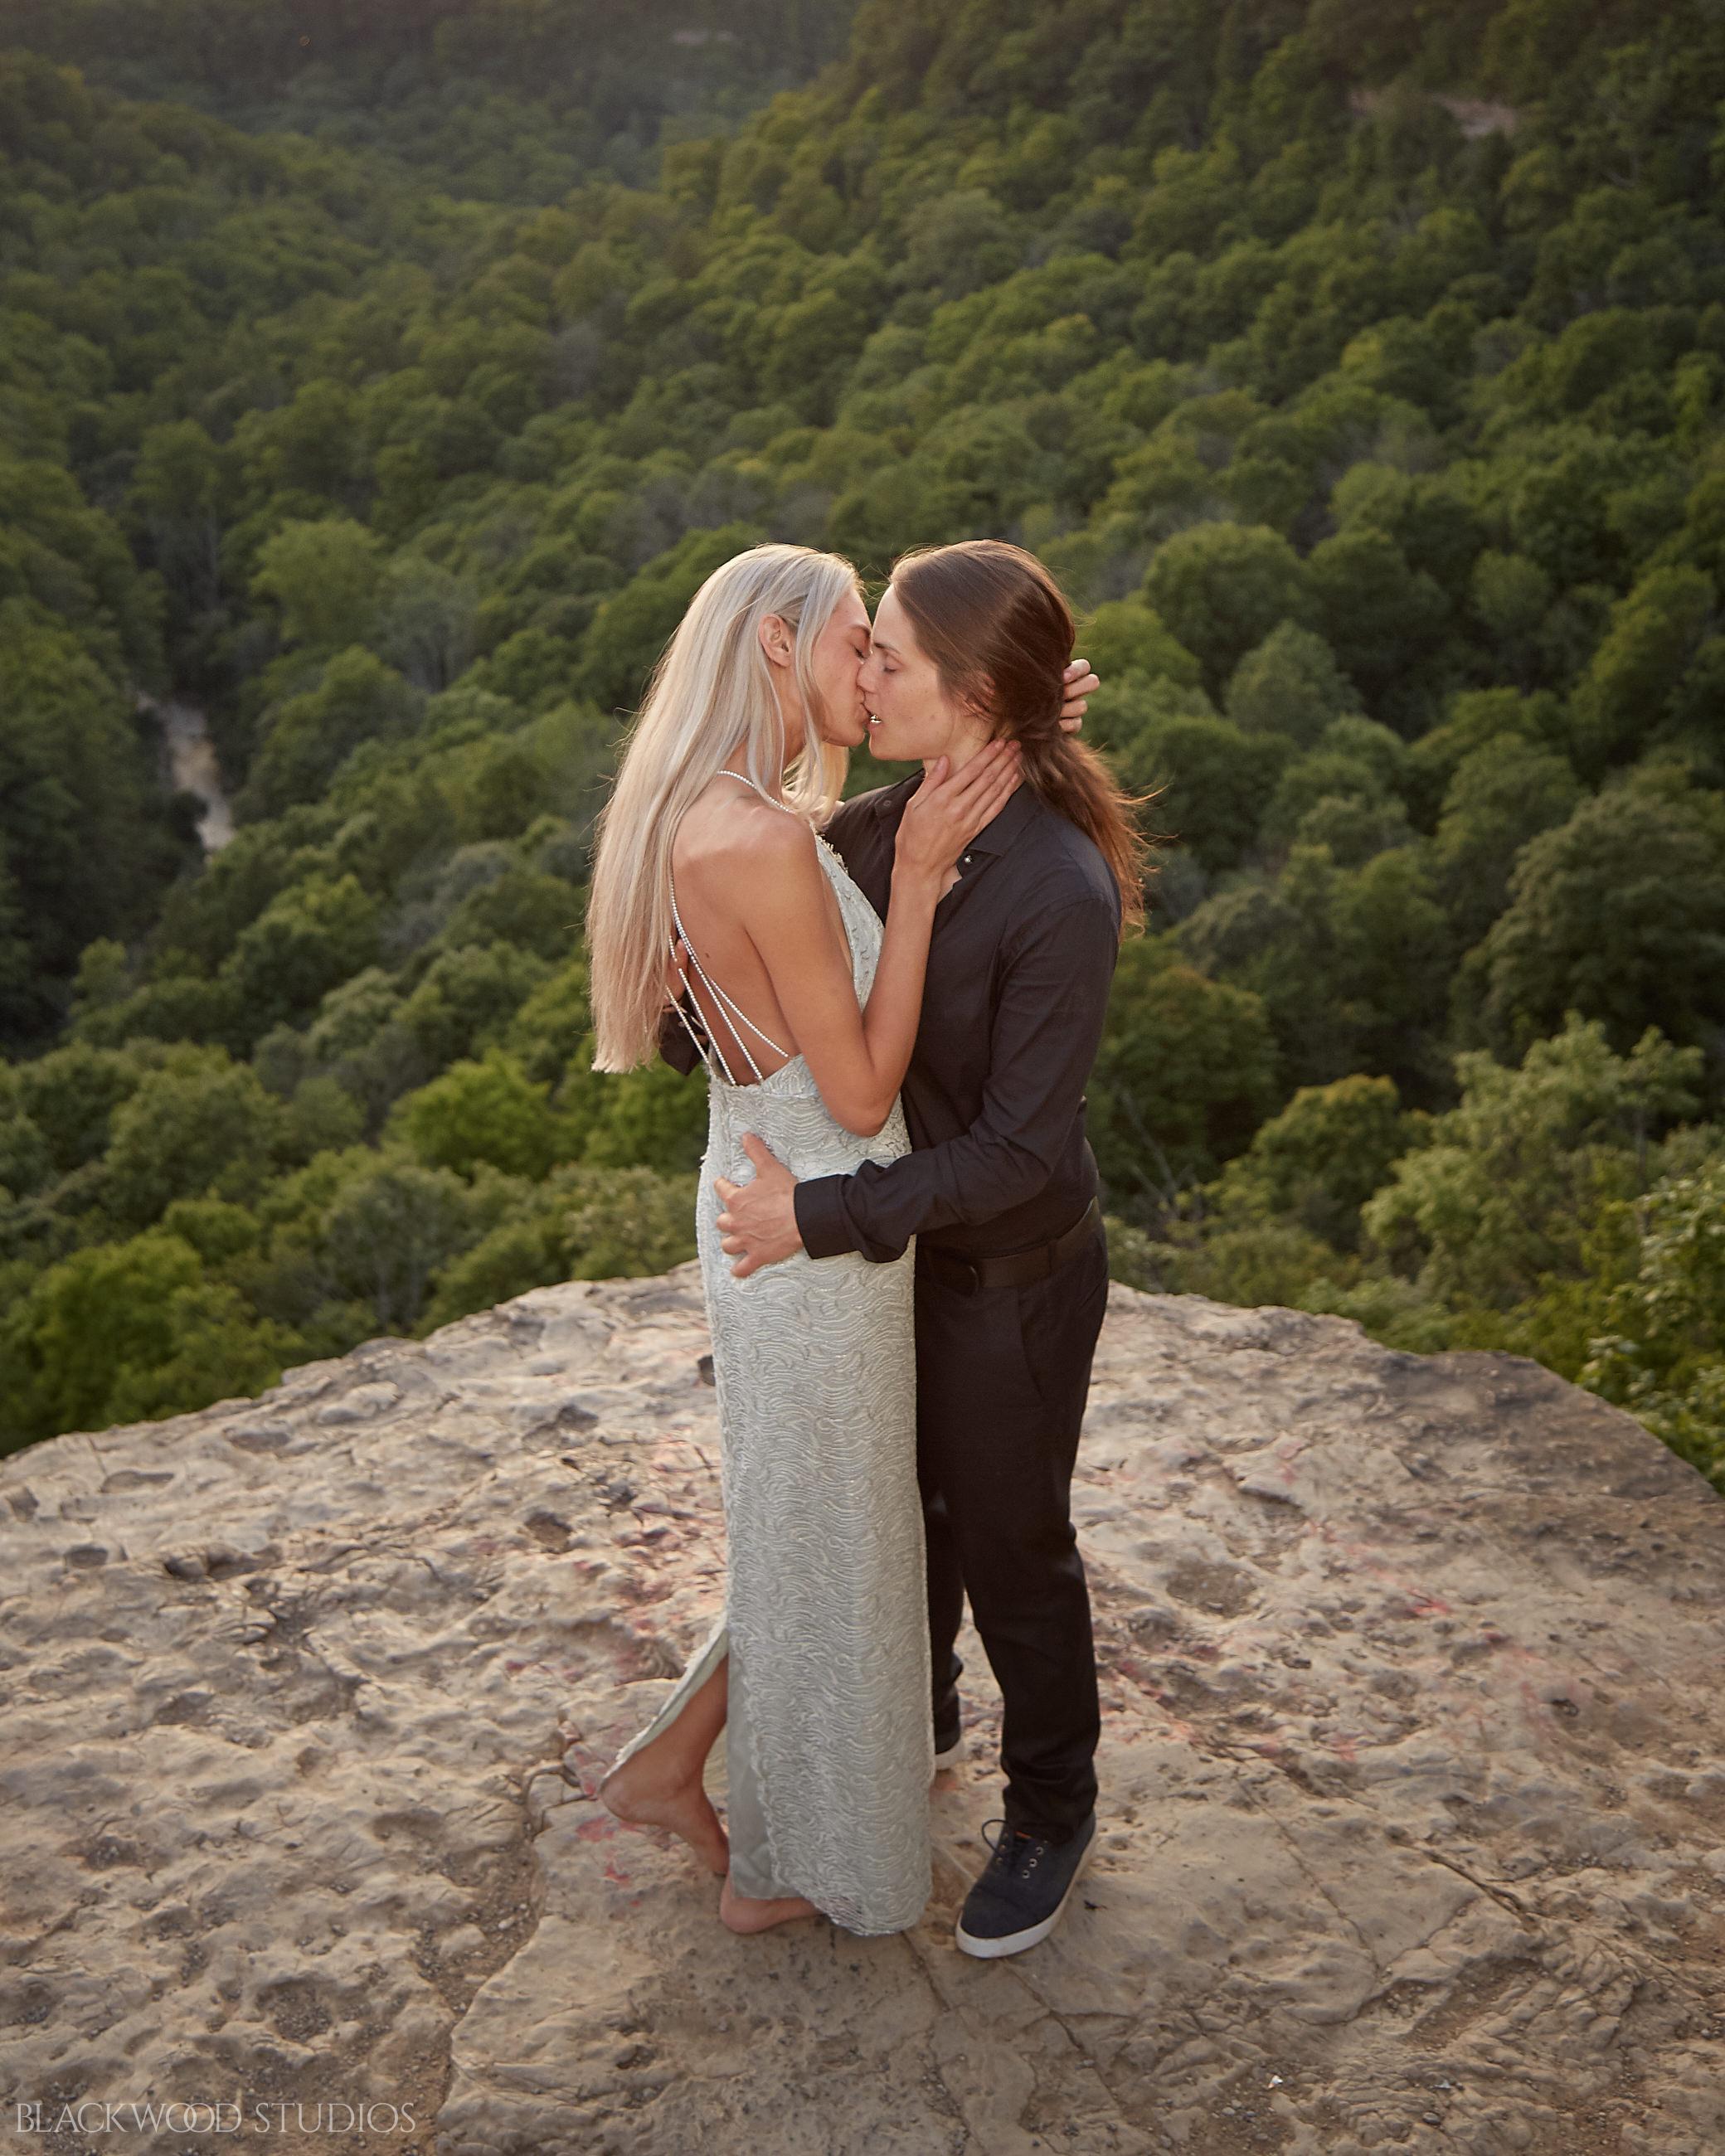 Maggie and Britt couple's session at Dundas Peak. Photo by Blackwood Studios (blackwoodstudios.co)